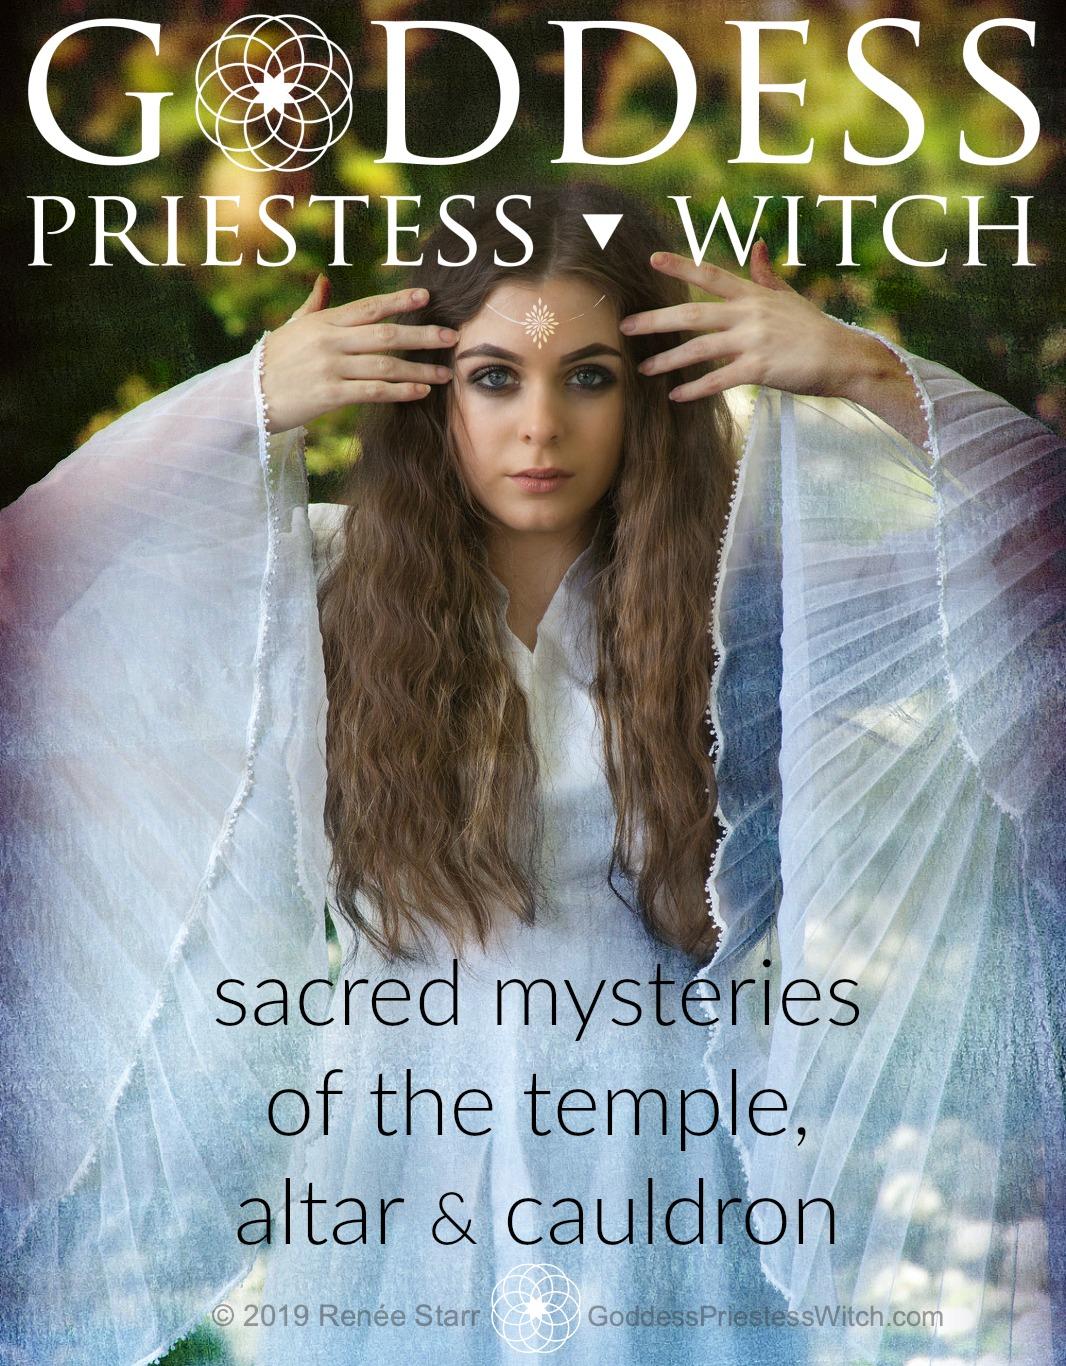 Goddess Priestess Witch IG.jpg